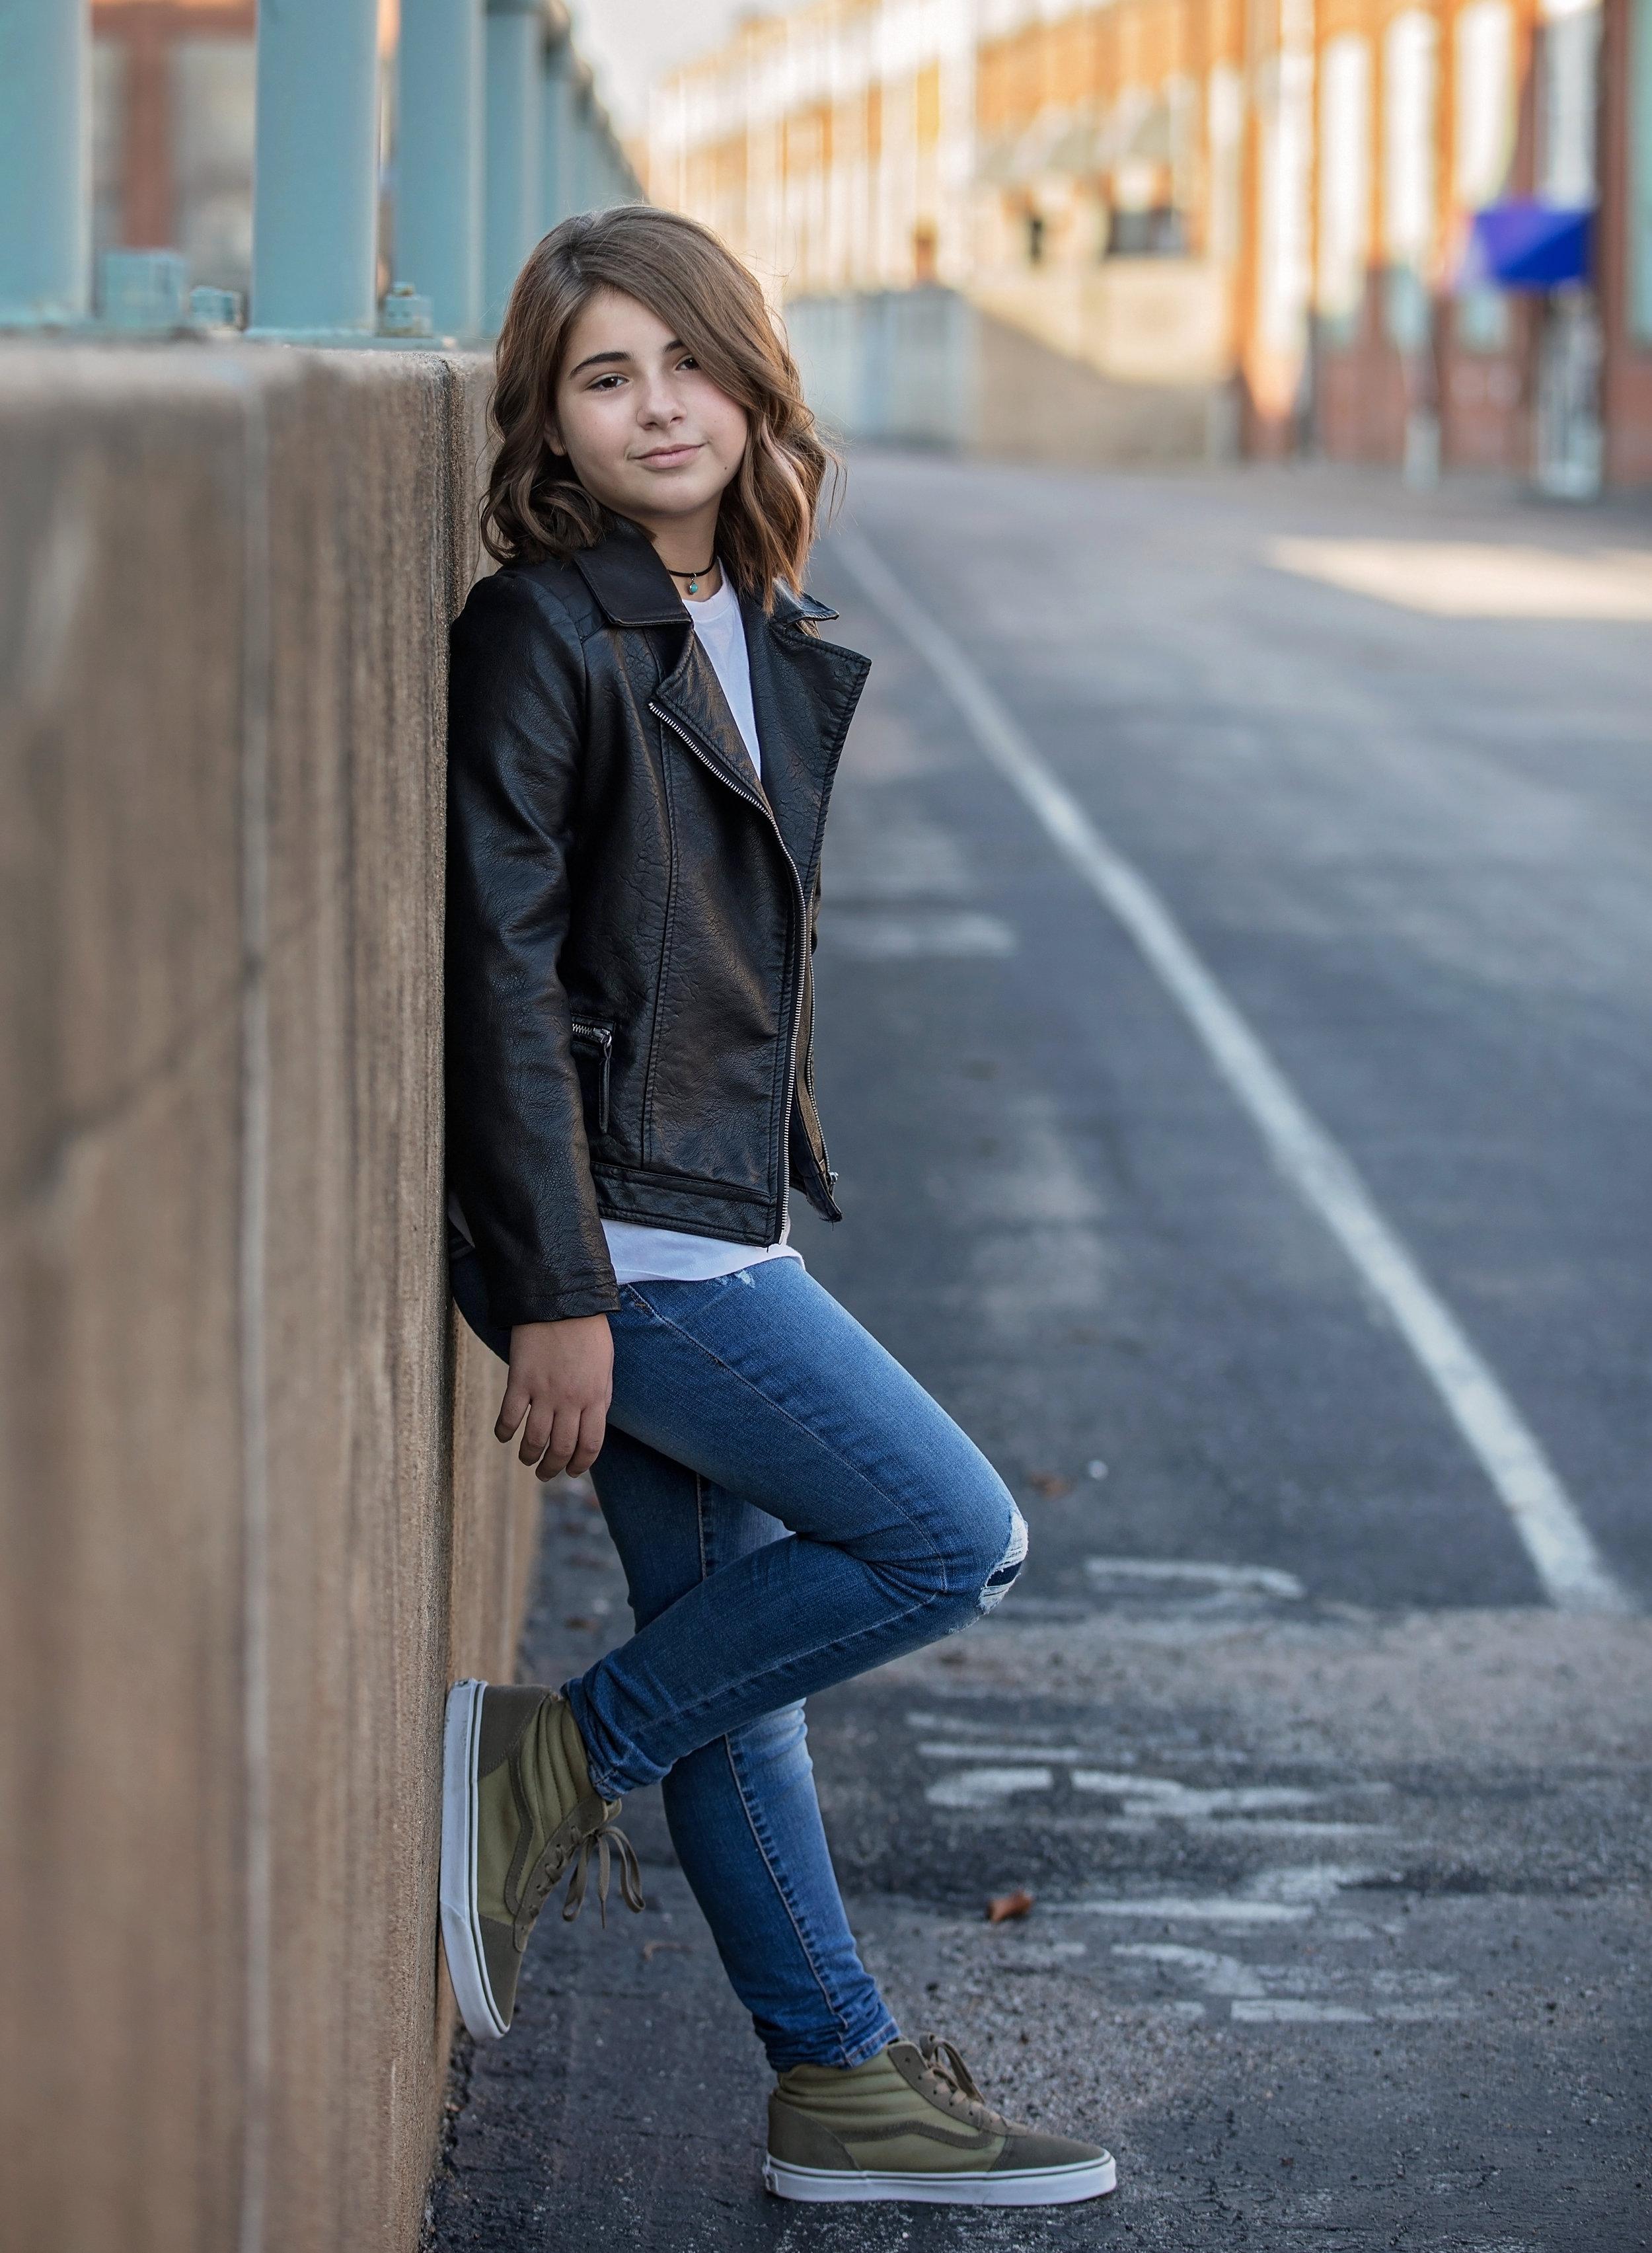 Kids Childrens Teens St Louis Photography.jpg